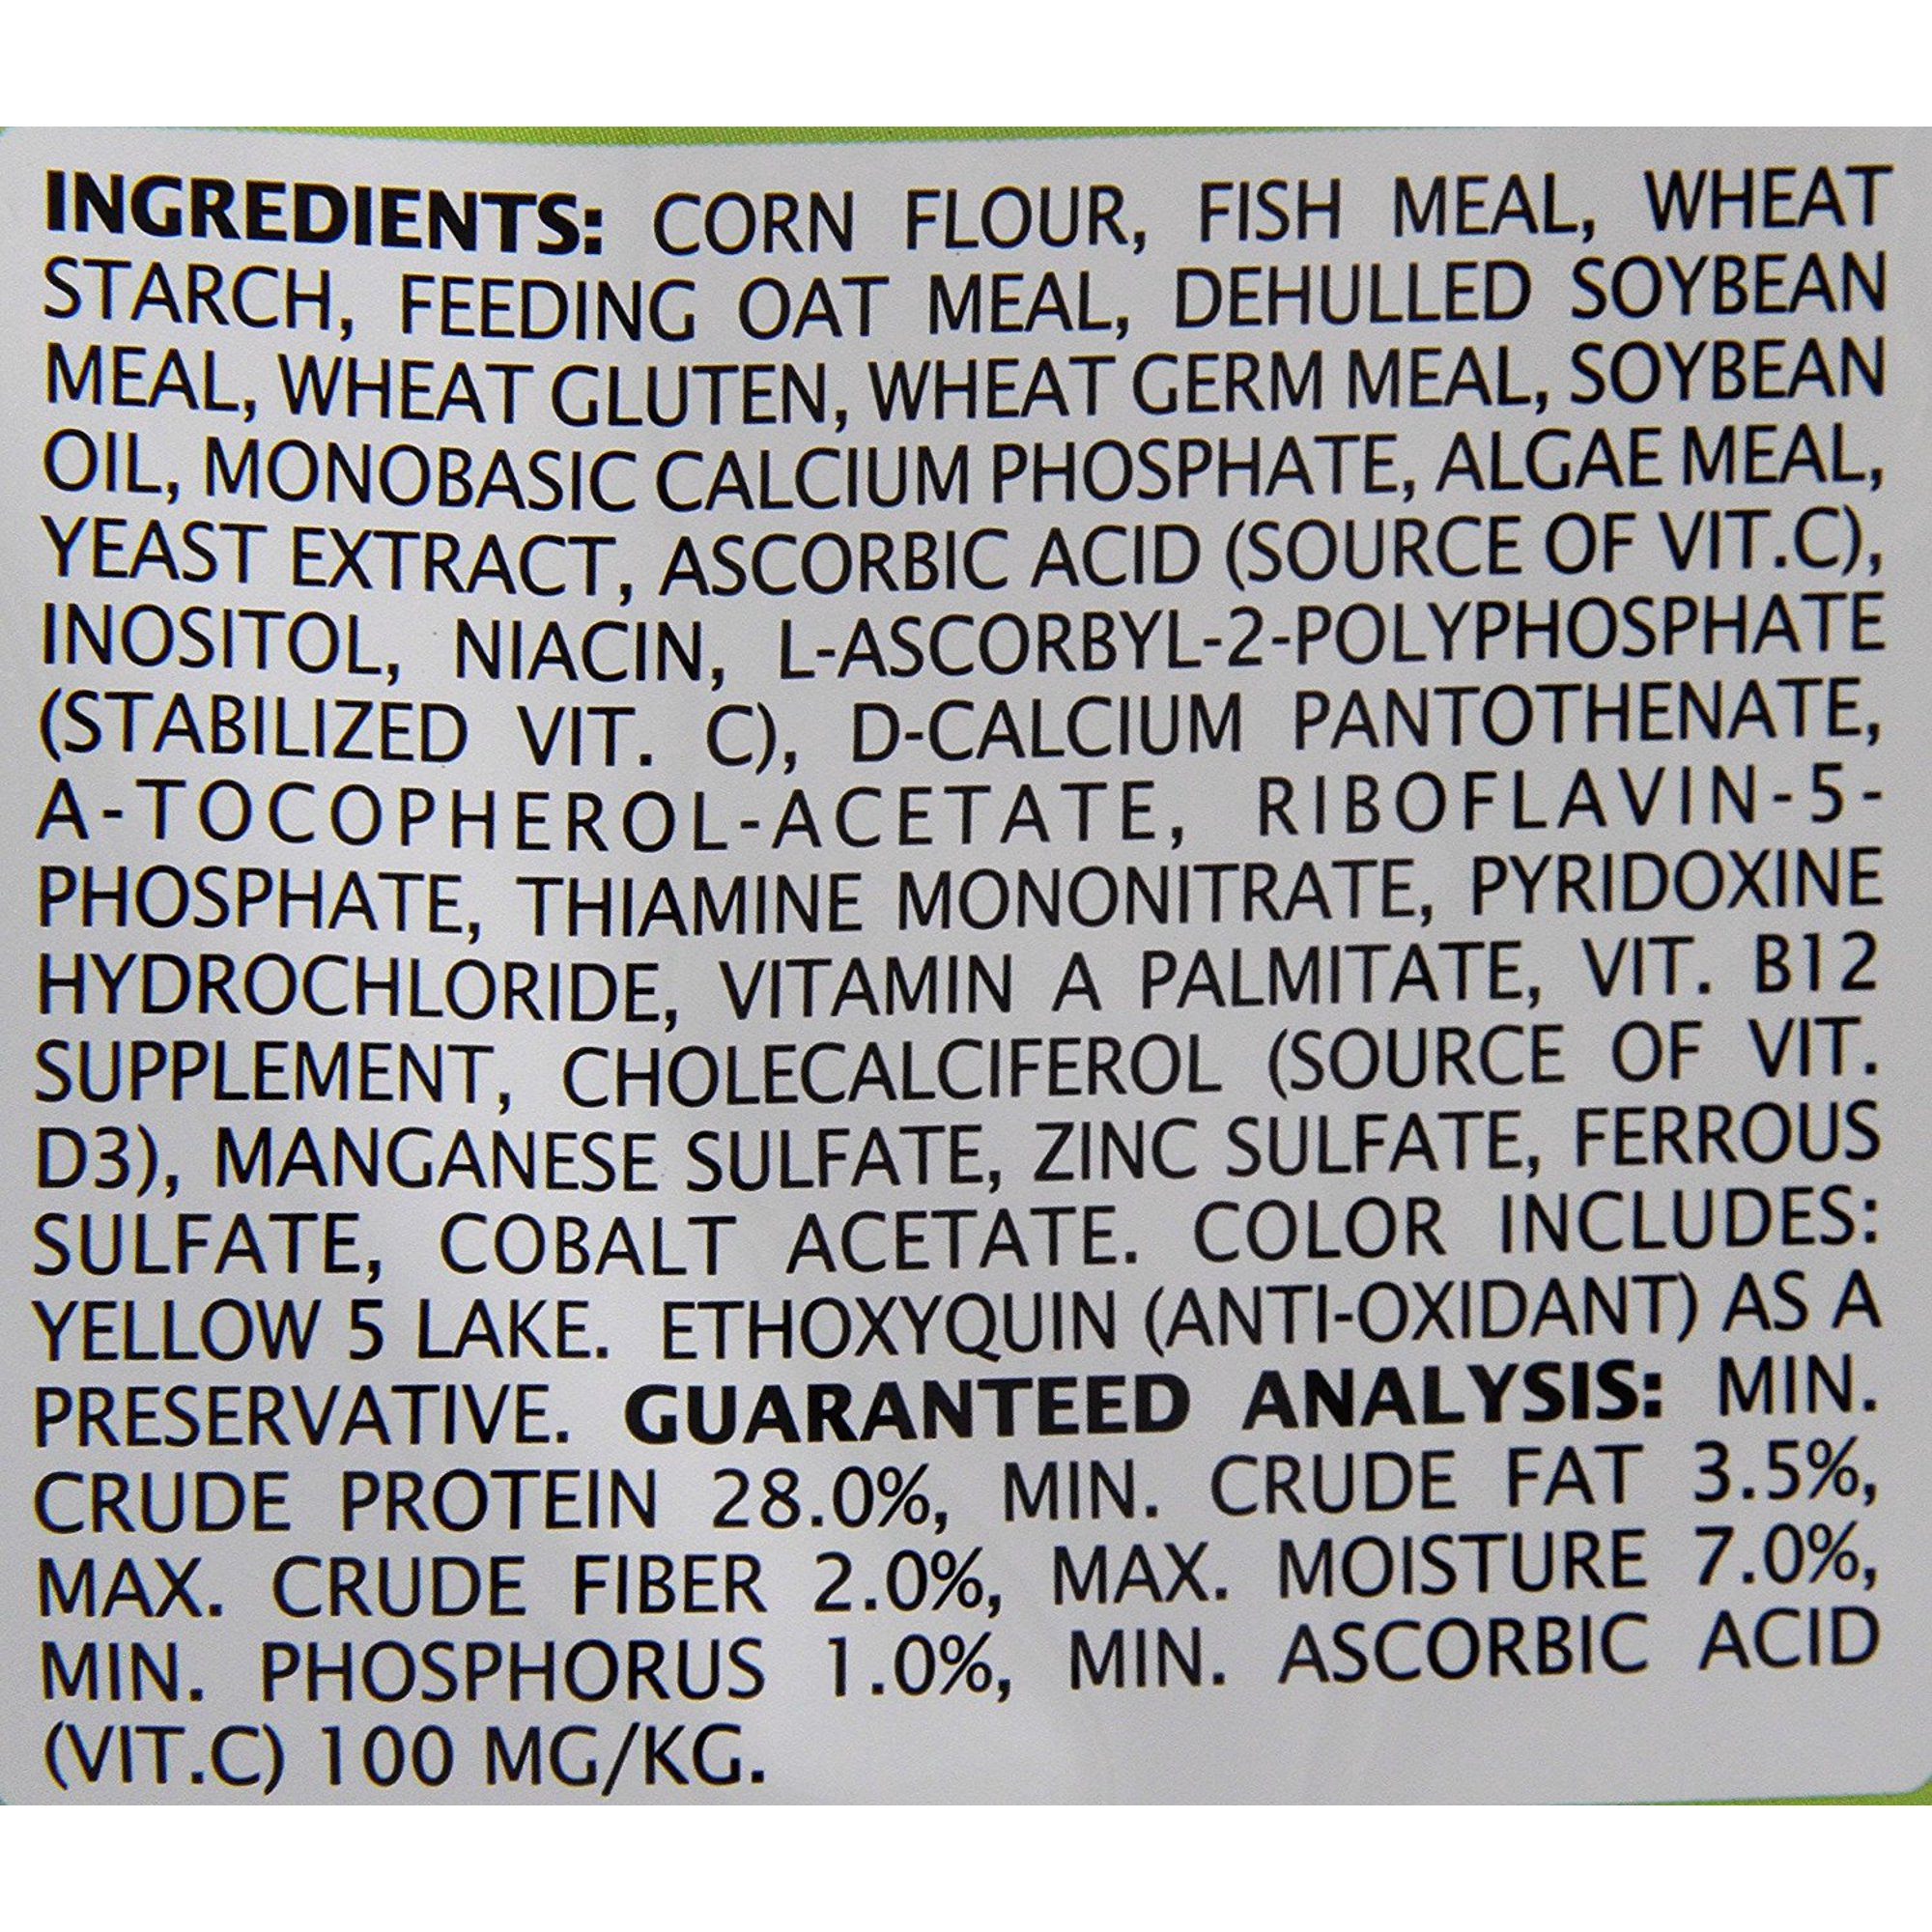 tetrapond 16482 pond sticks healthy nutrition for goldfish and koi 1 pound 4 liter premium nutrition for goldfish and koi by tetra pond walmart com walmart com walmart